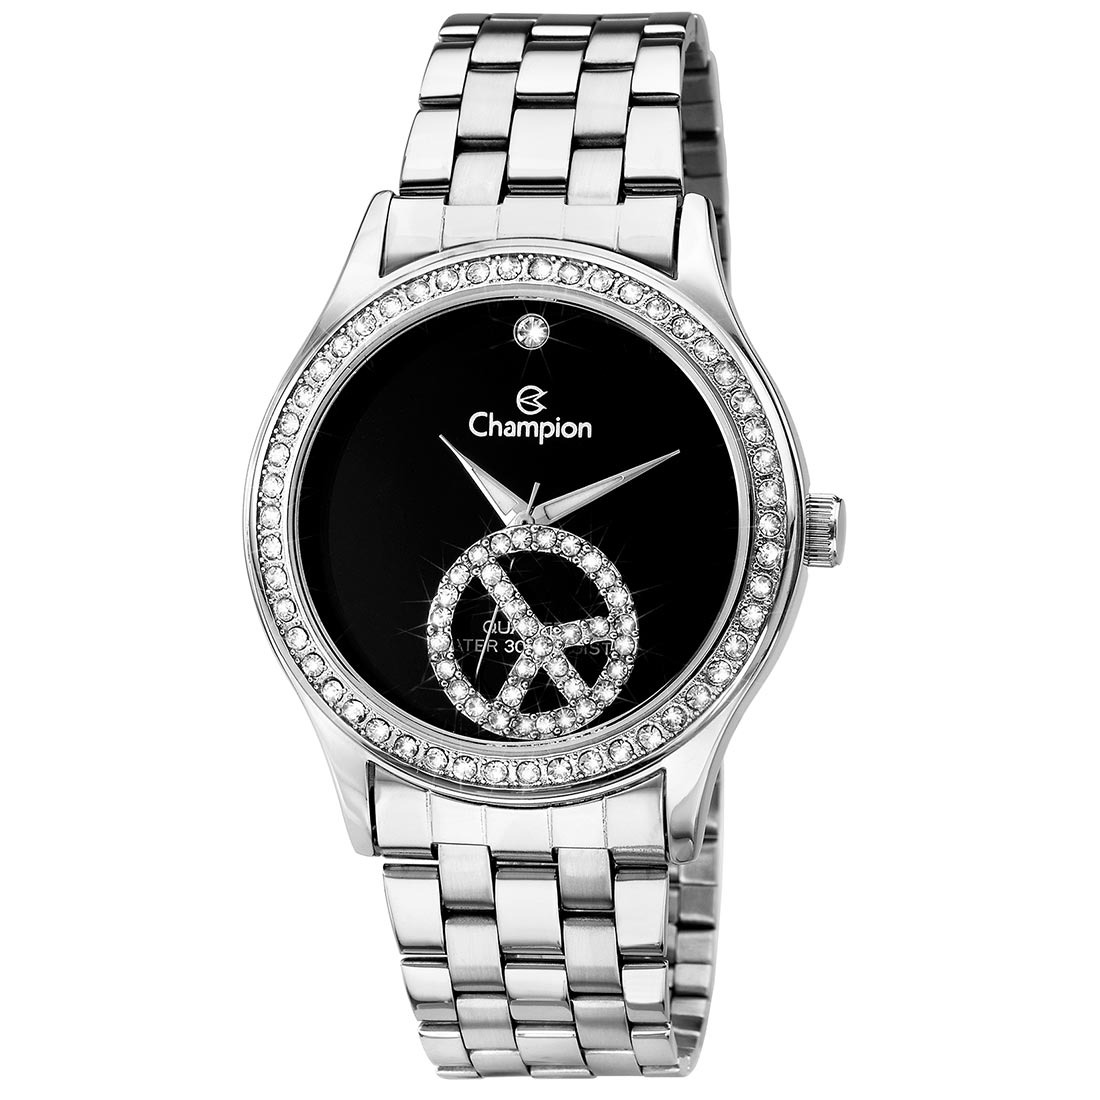 64cd781424f relógio feminino analógico social champion peace - ch25785t. Carregando  zoom.